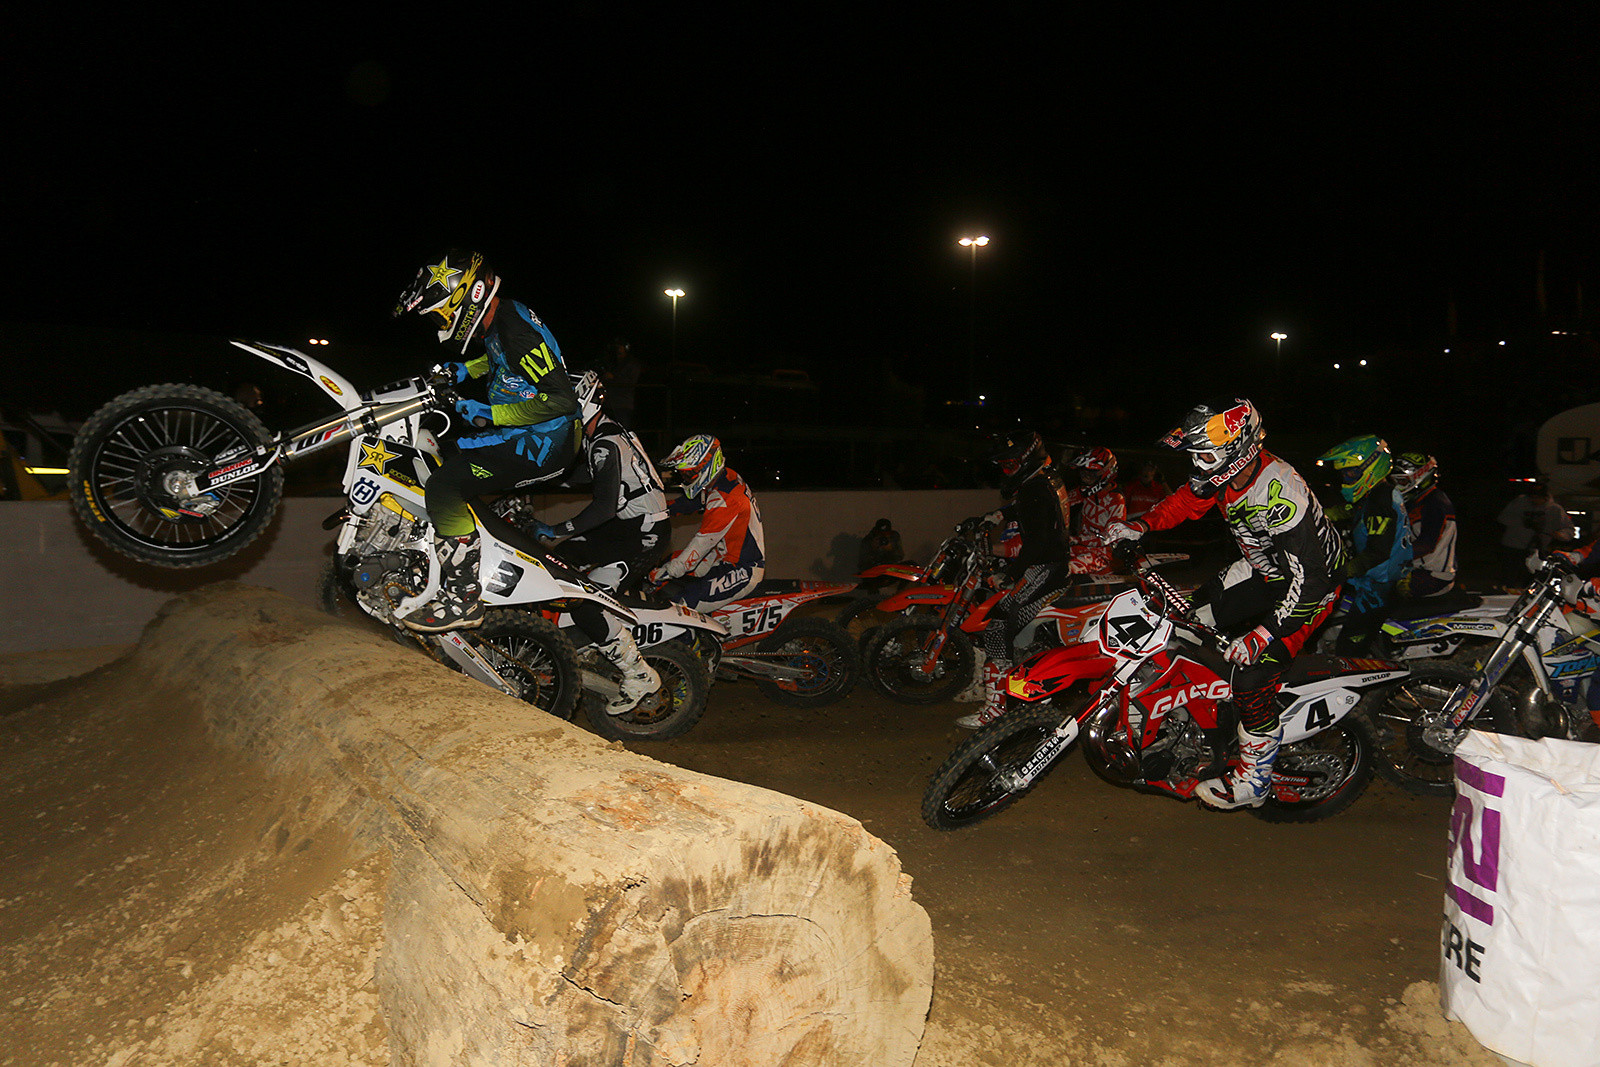 Mike Brown - Endurocross Finals - Motocross Pictures - Vital MX